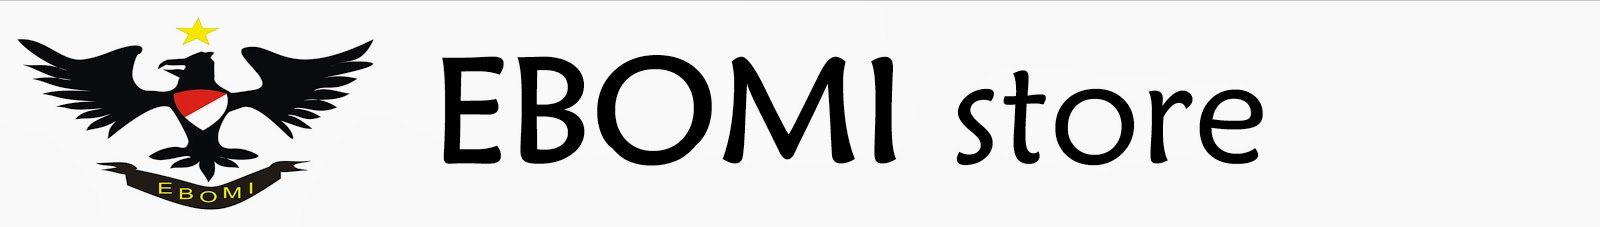 logo Ebomi